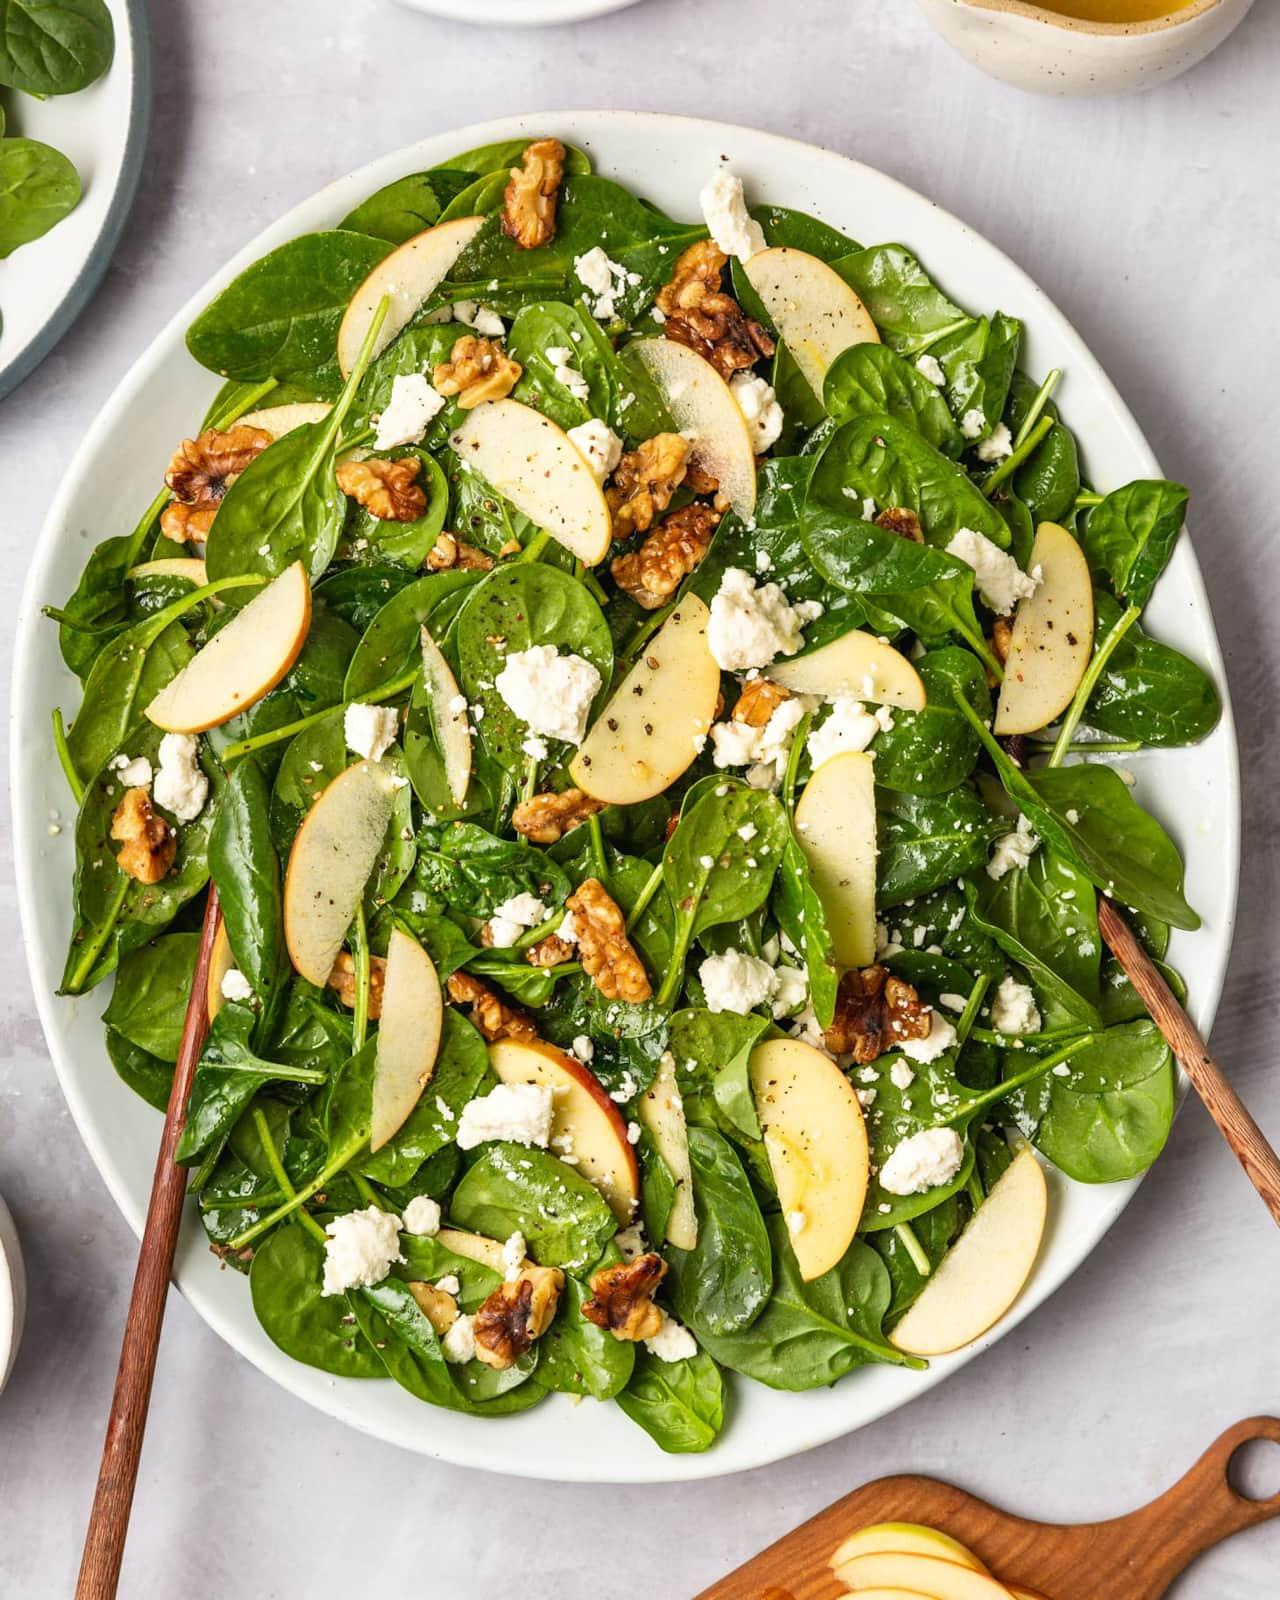 Kitchn Spinach, Feta, Apple and Walnut Salad